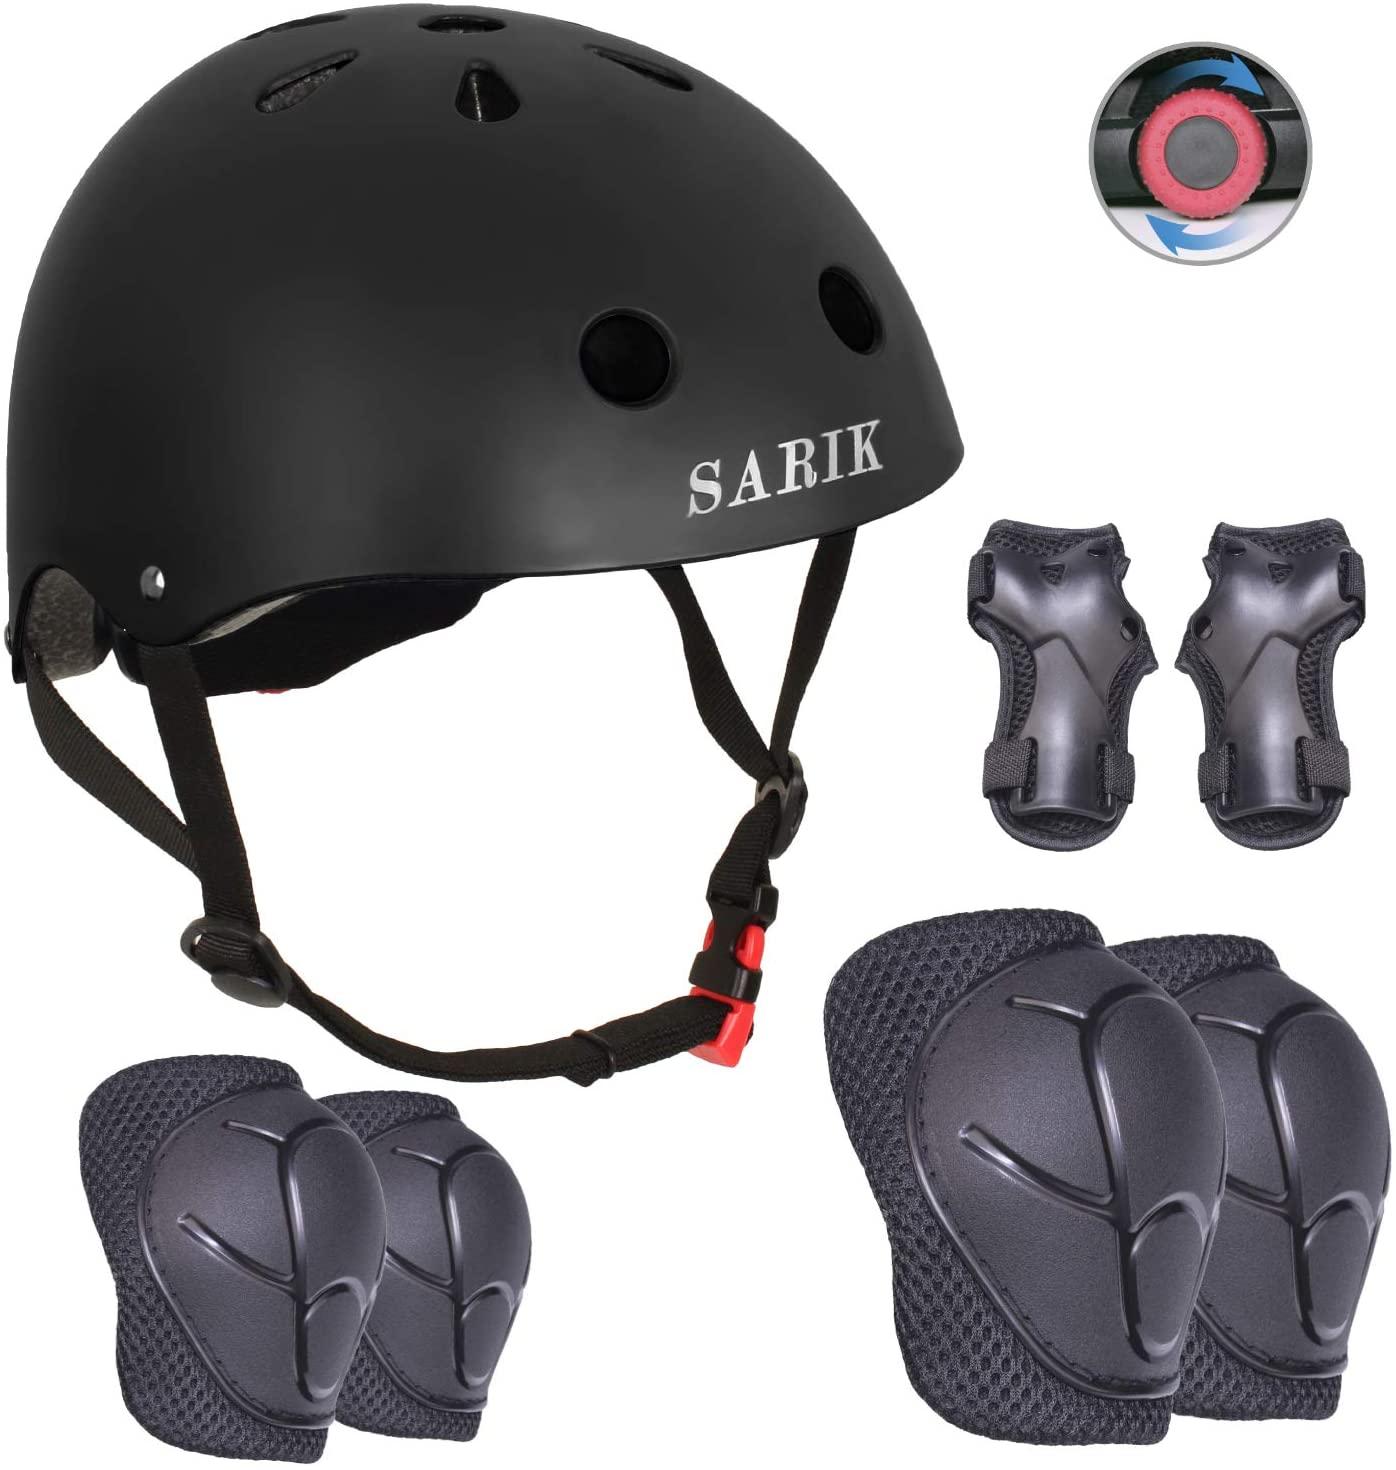 Sarik Kids Bike Helmet Knee Elbow Pads Wrist Guard for Ages 3-8 Years Toddler Boys Girls Helmet Sport Protective Gear Adjustable Scooter Skateboard Rollerblading Skate Cycling Safety Set